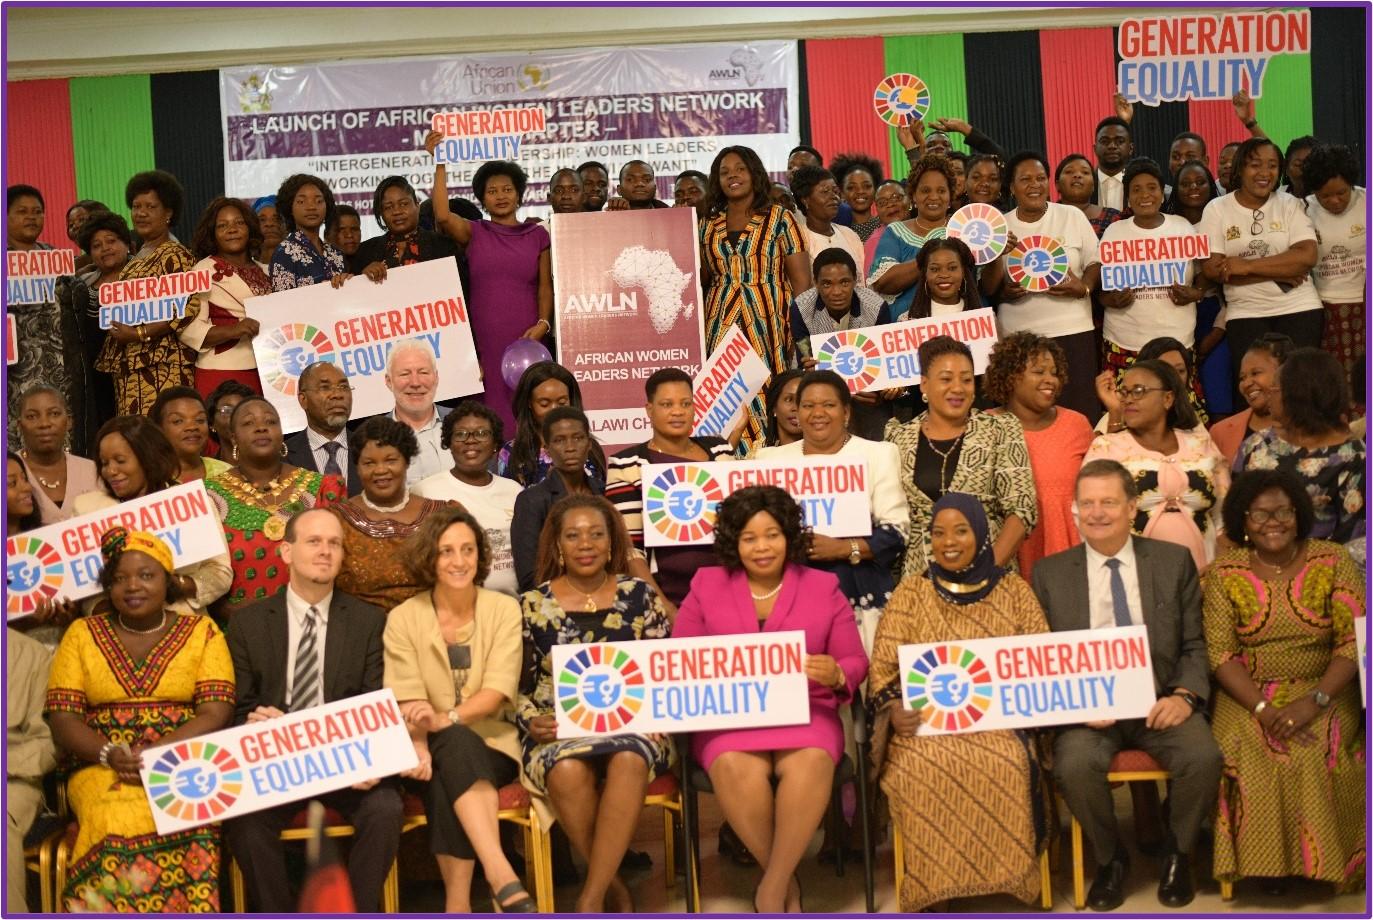 Lilongwe, 2 March 2020, Group Photo after launch of AWLN Malawi Chapter. Photo credit: UN Women Malawi